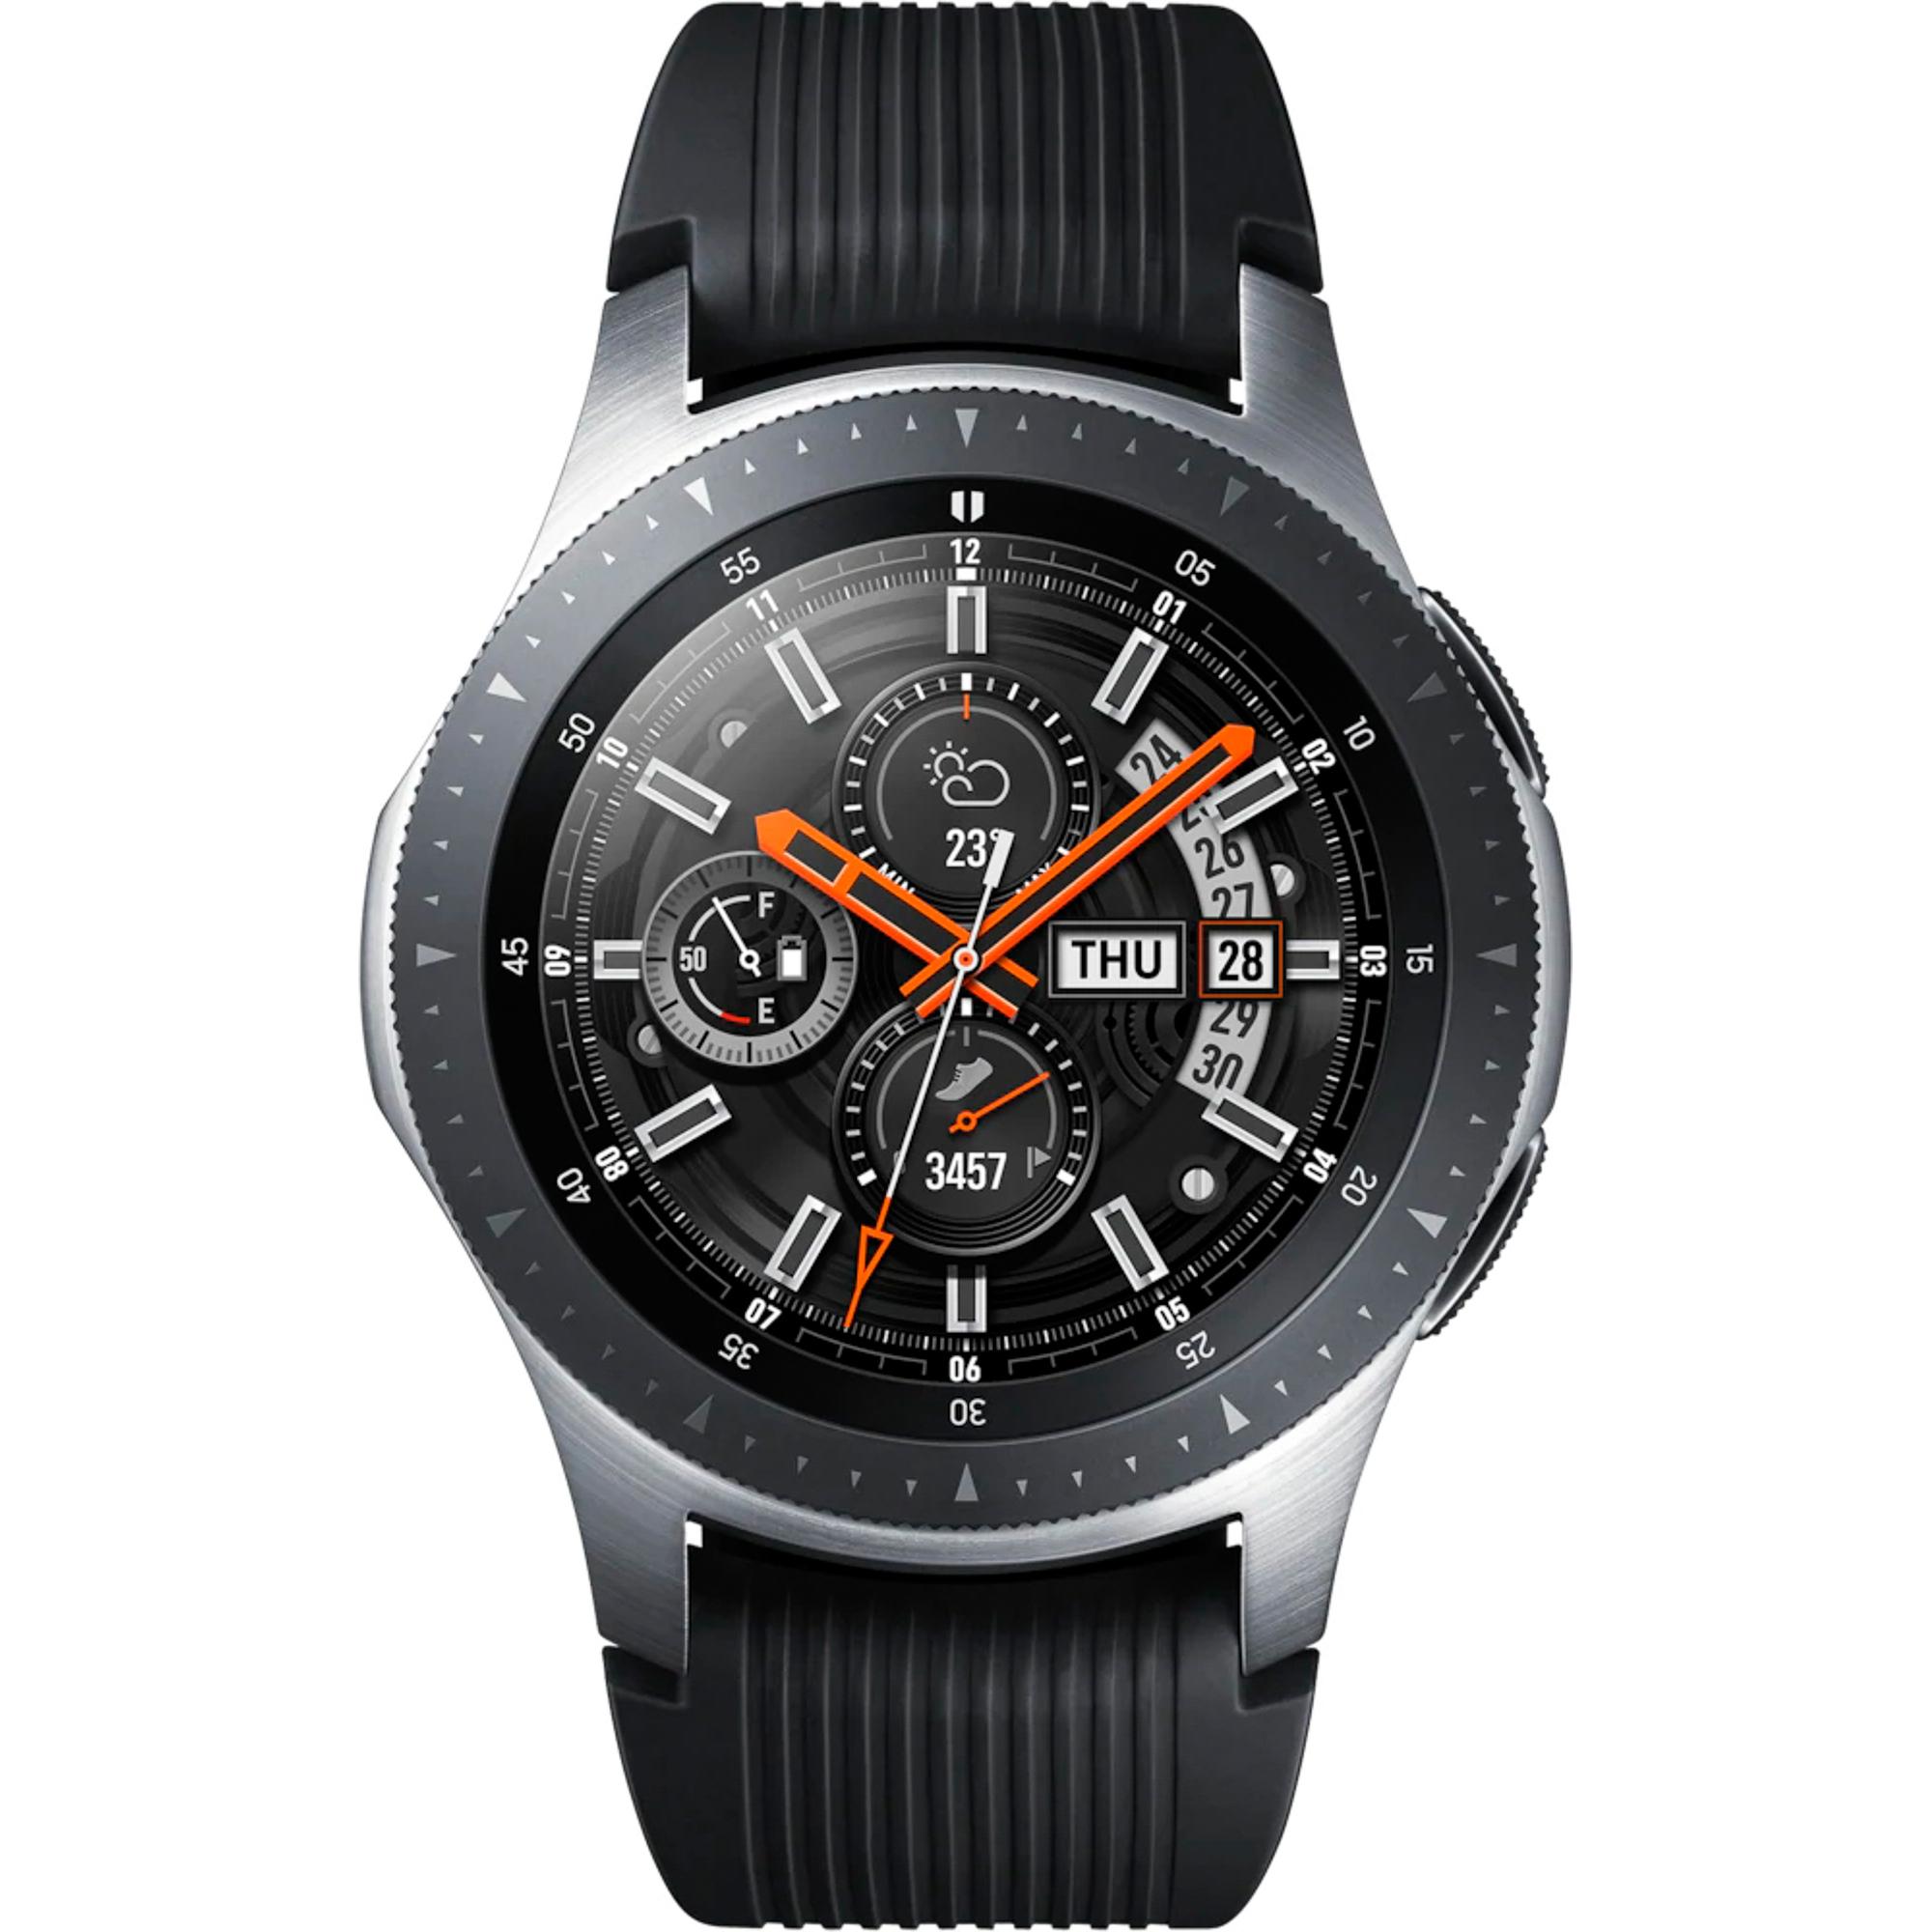 Фото - Умные часы Samsung Galaxy Watch 46 мм SM-R800 серебристая сталь смарт часы samsung galaxy watch 1 3 super amoled серебристый sm r800nzsaser